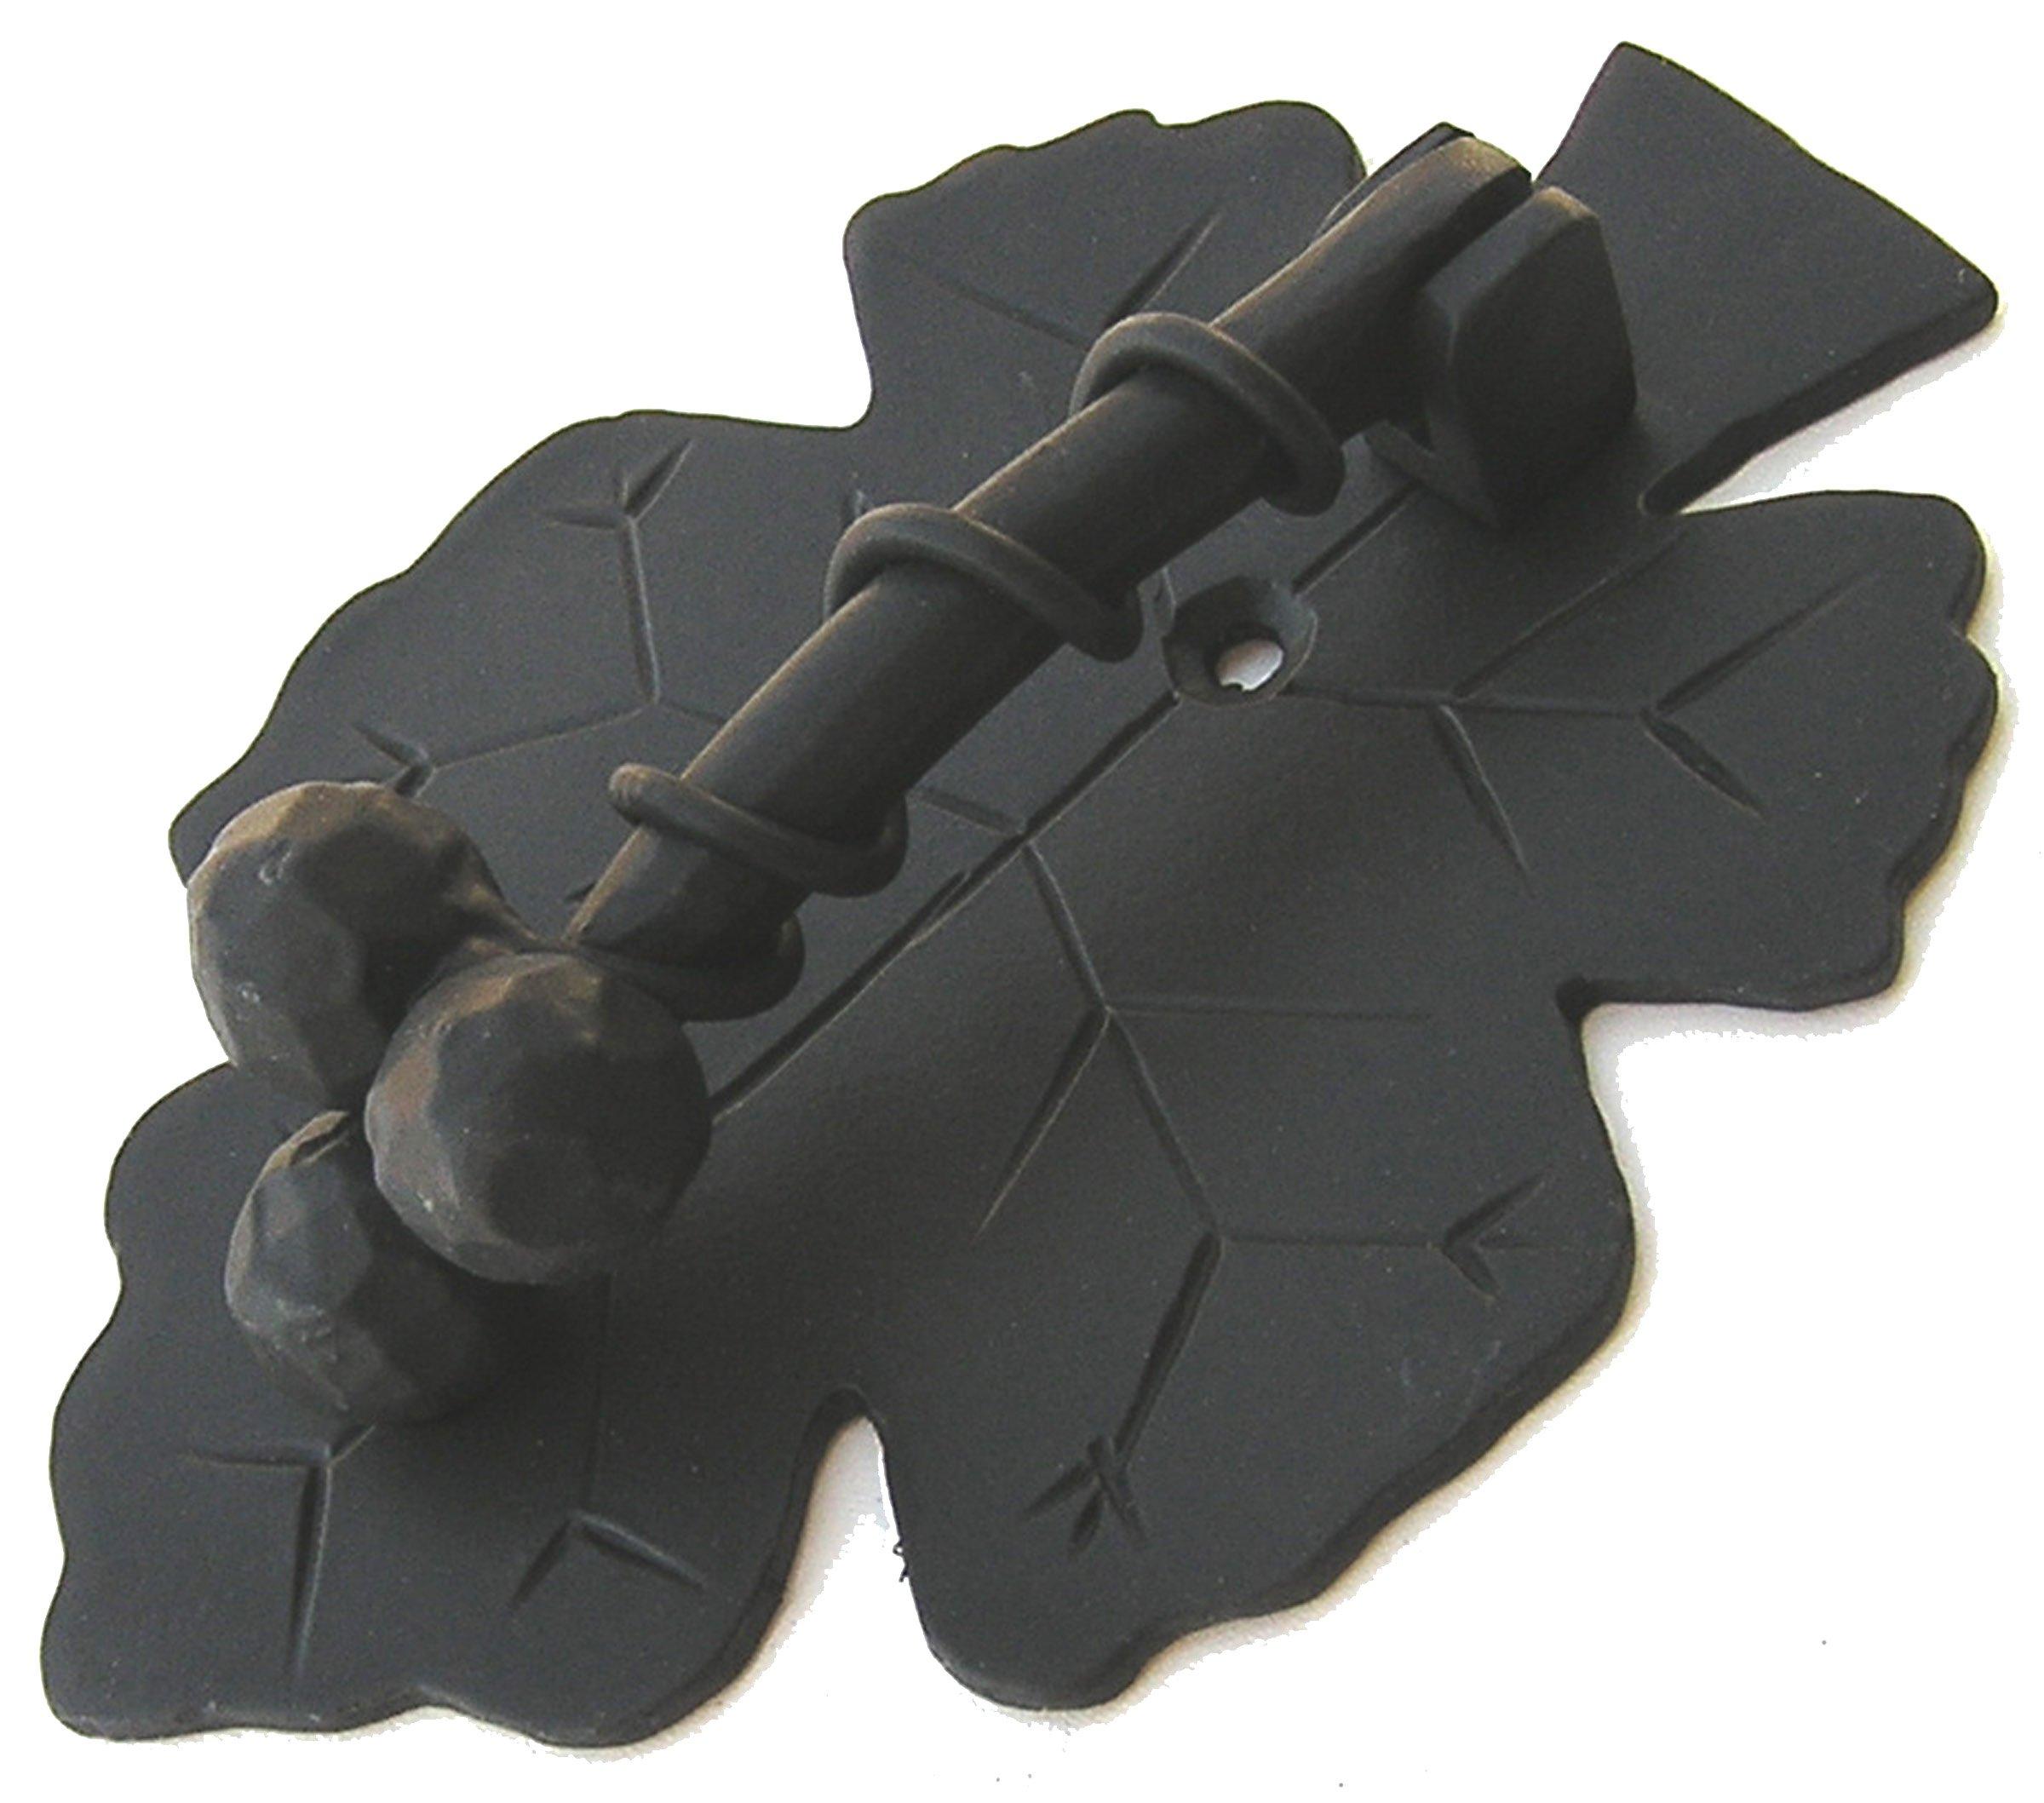 Agave Ironworks Grapevine Knocker, Flat Black Finish